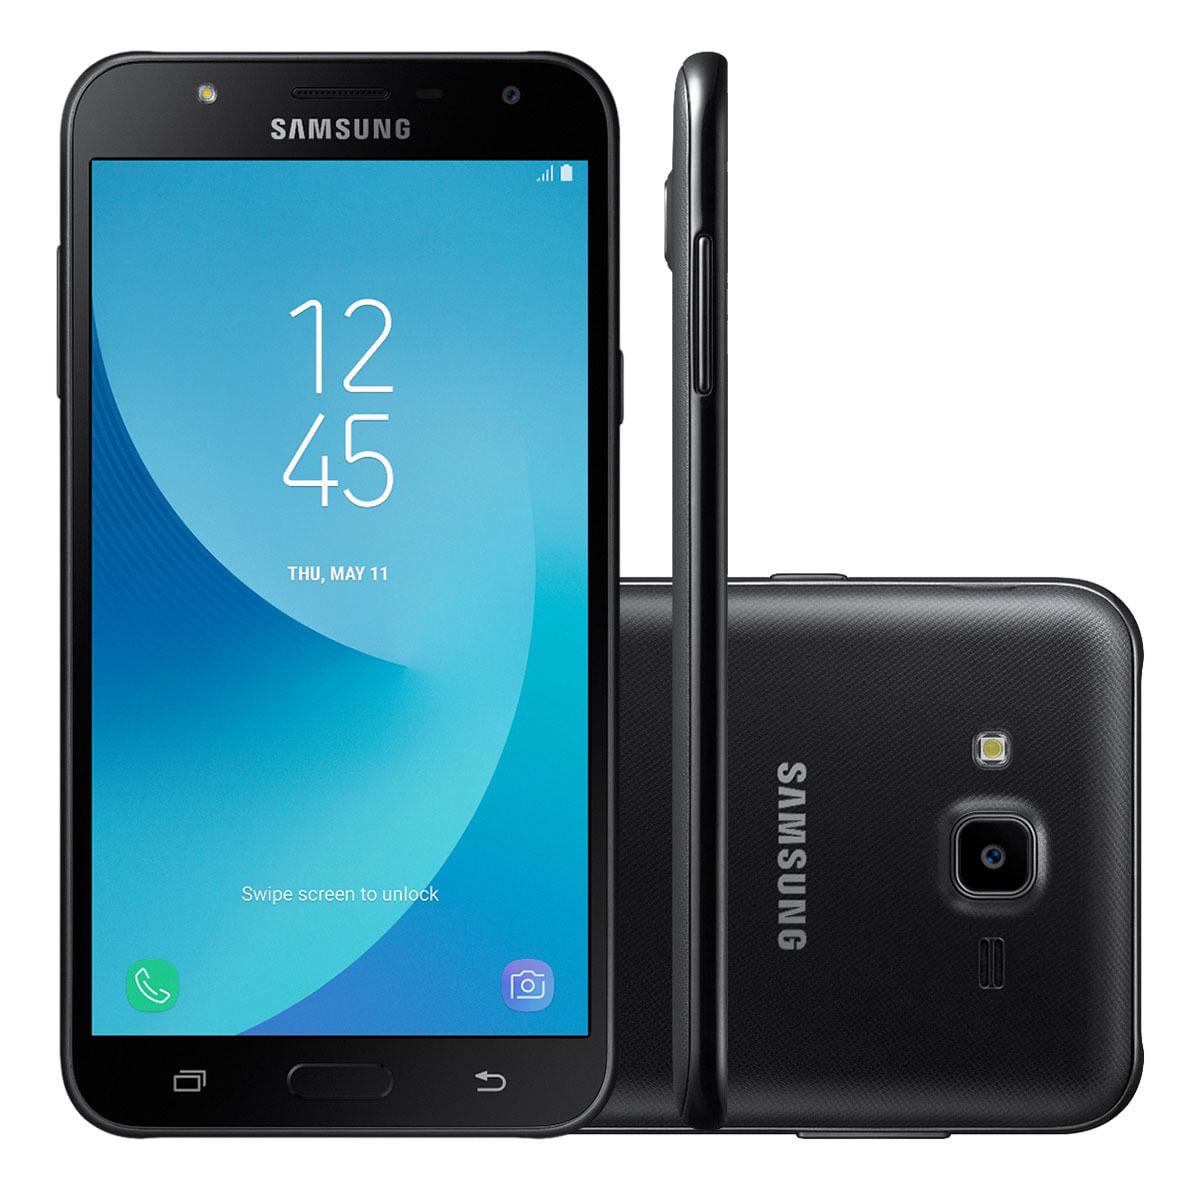 Celular Smartphone Samsung Galaxy J7 Neo J701mt 16gb Preto - Dual Chip